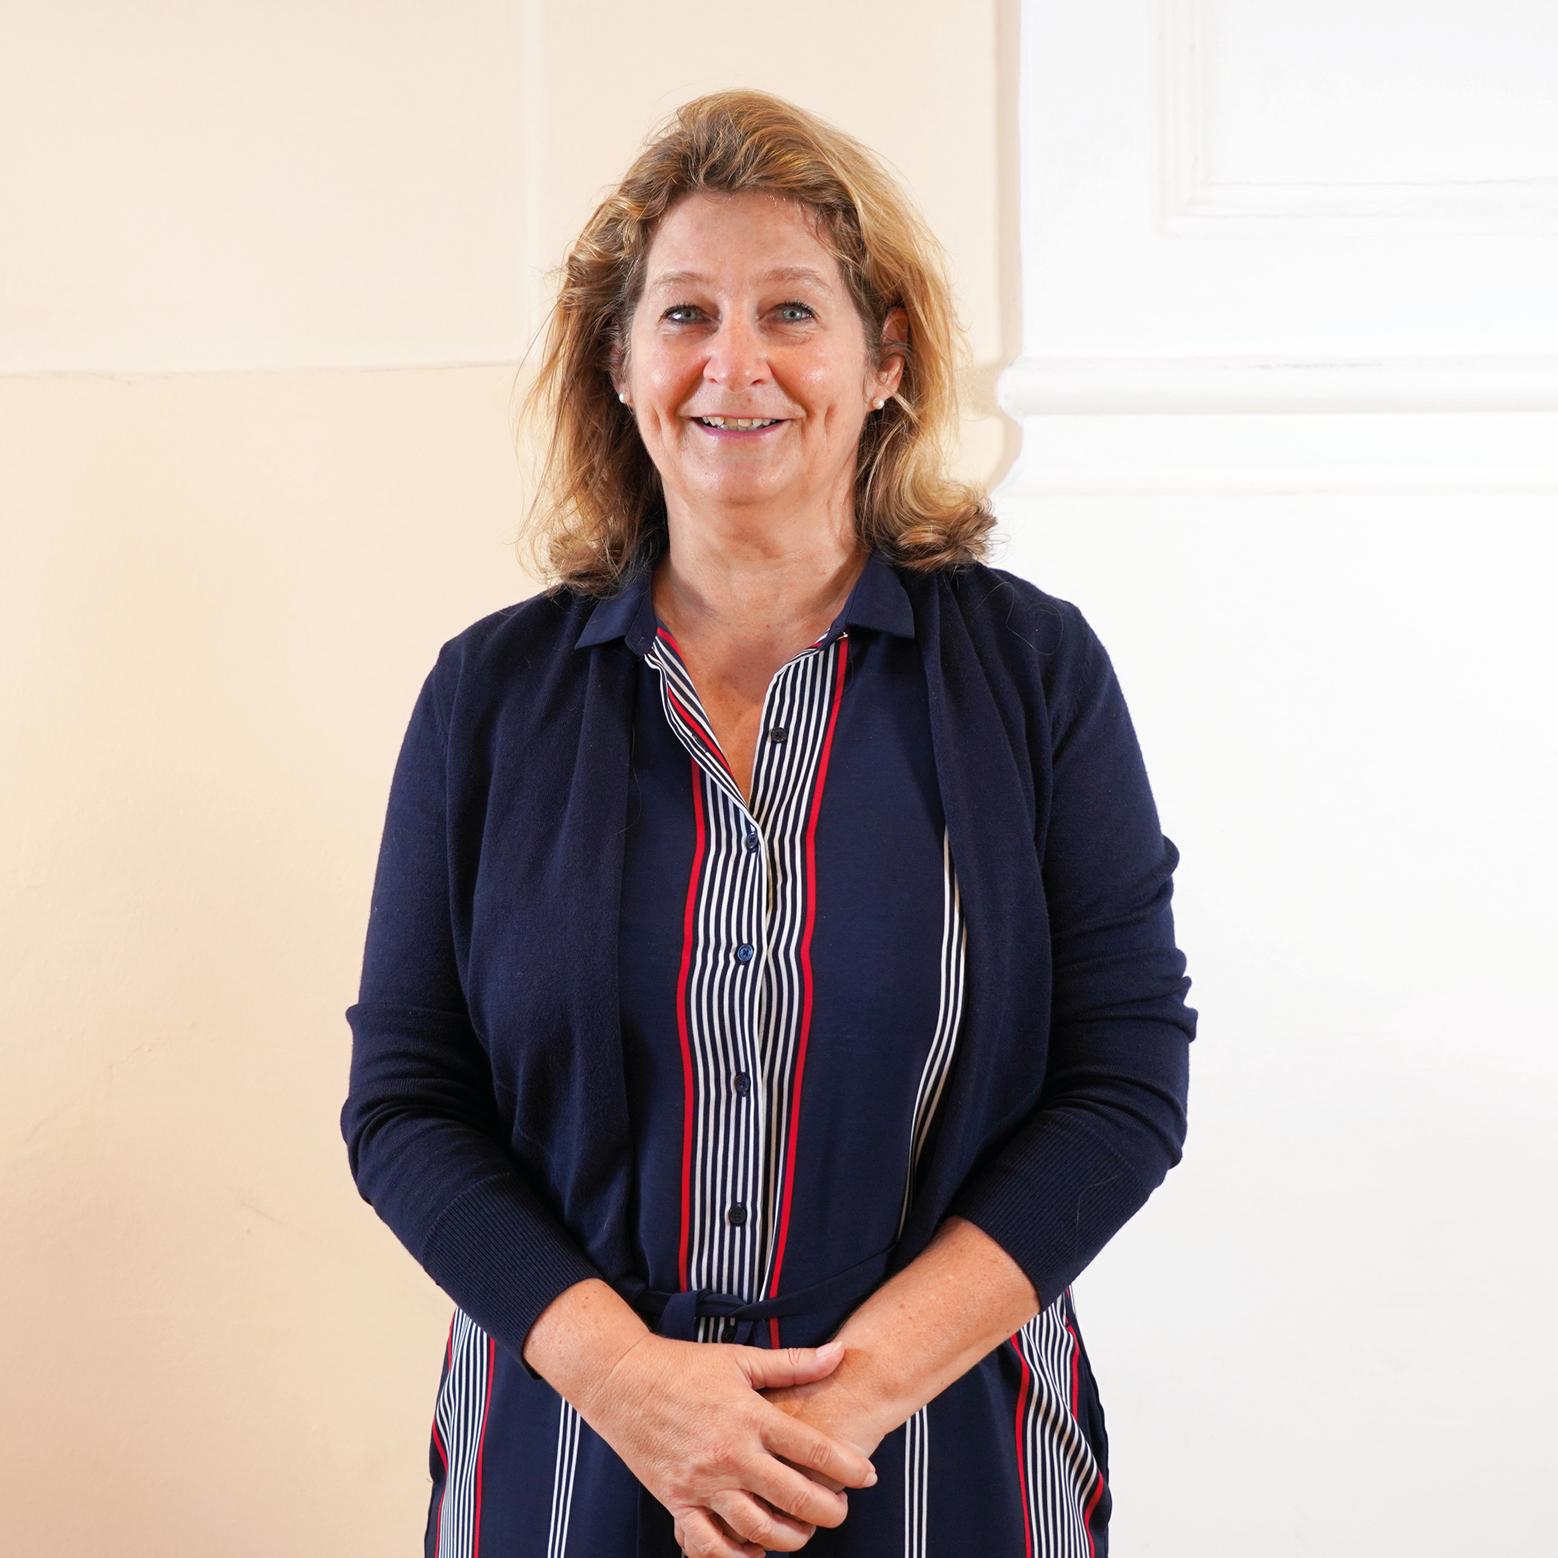 Mitarbeiter2 Susanne Reisegger